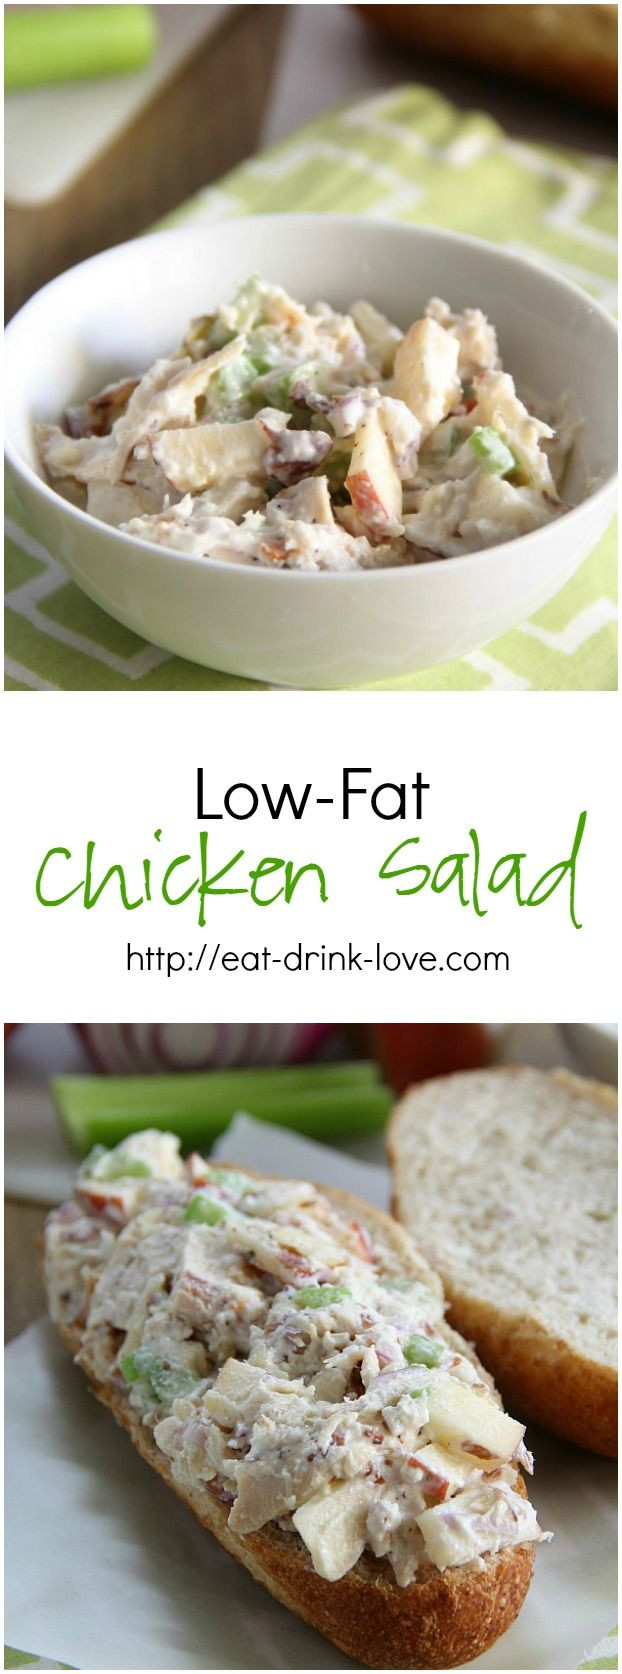 Healthy Low Fat Chicken Recipes  Best 25 Low fat chicken recipes ideas on Pinterest